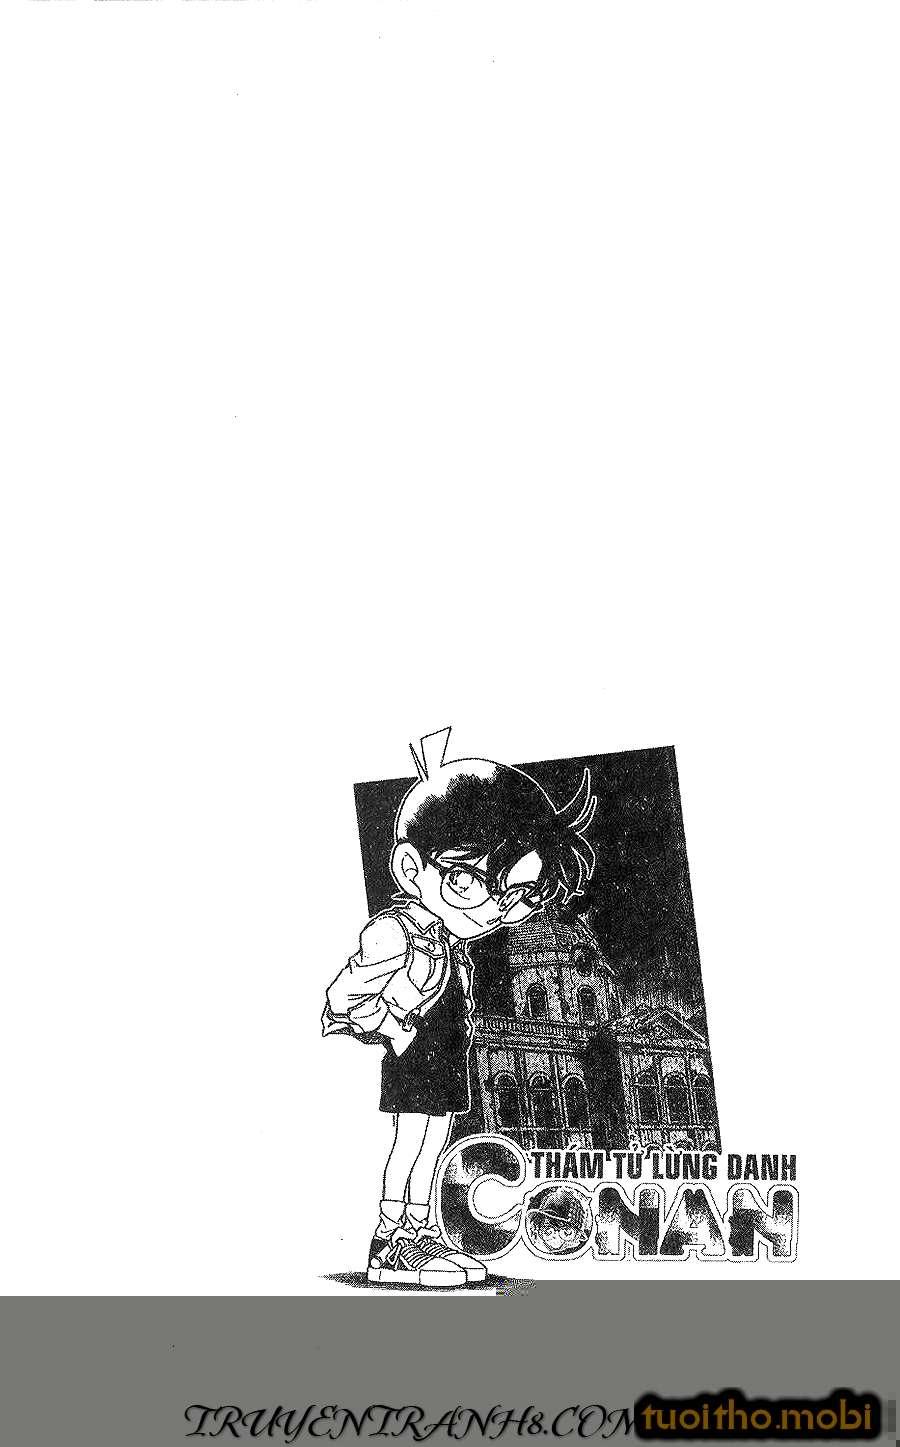 conan chương 300 trang 1